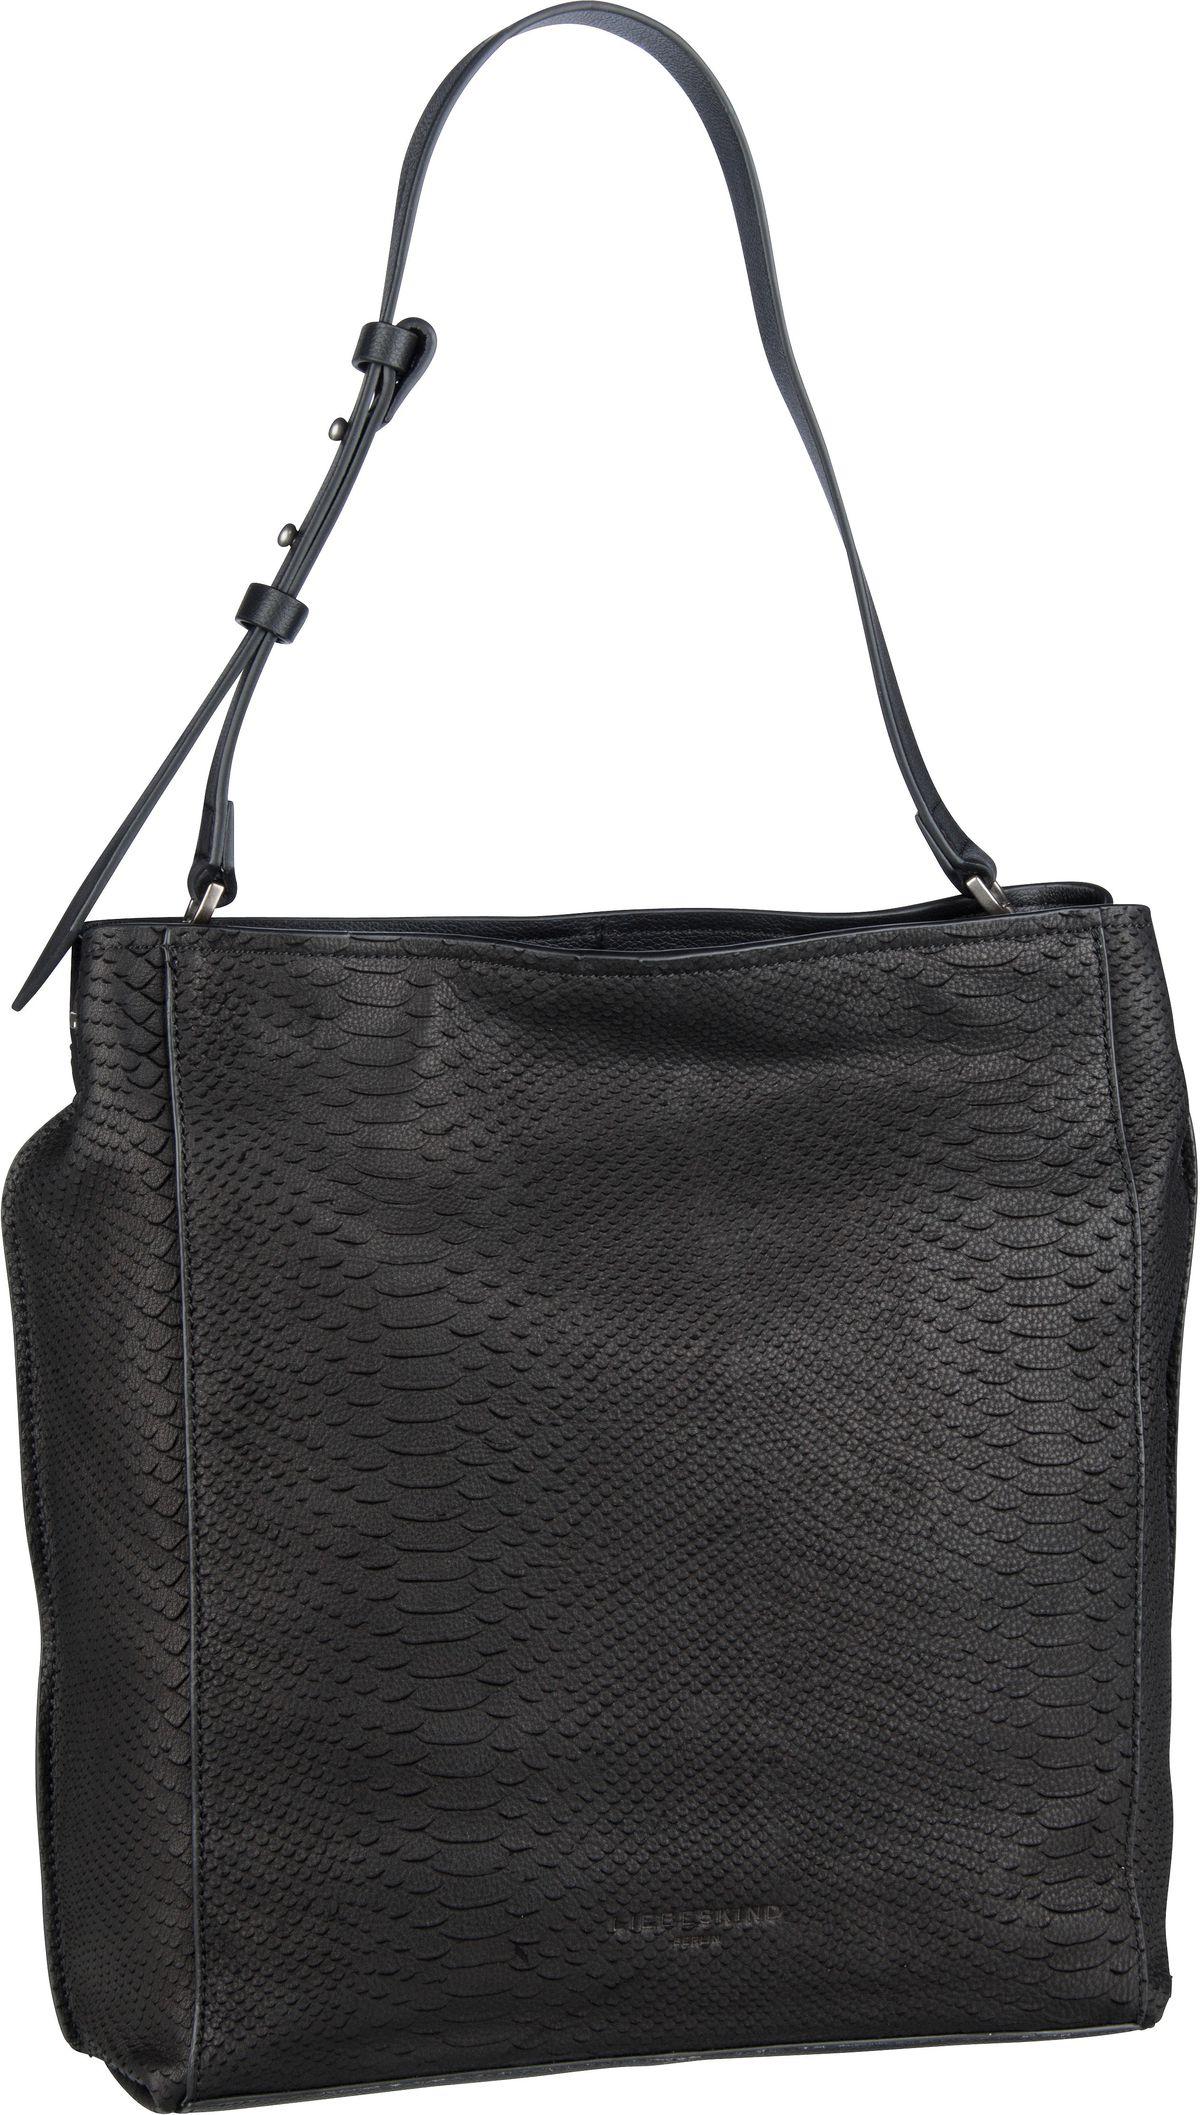 Berlin Handtasche Scouri 2 Hobo M Python Black